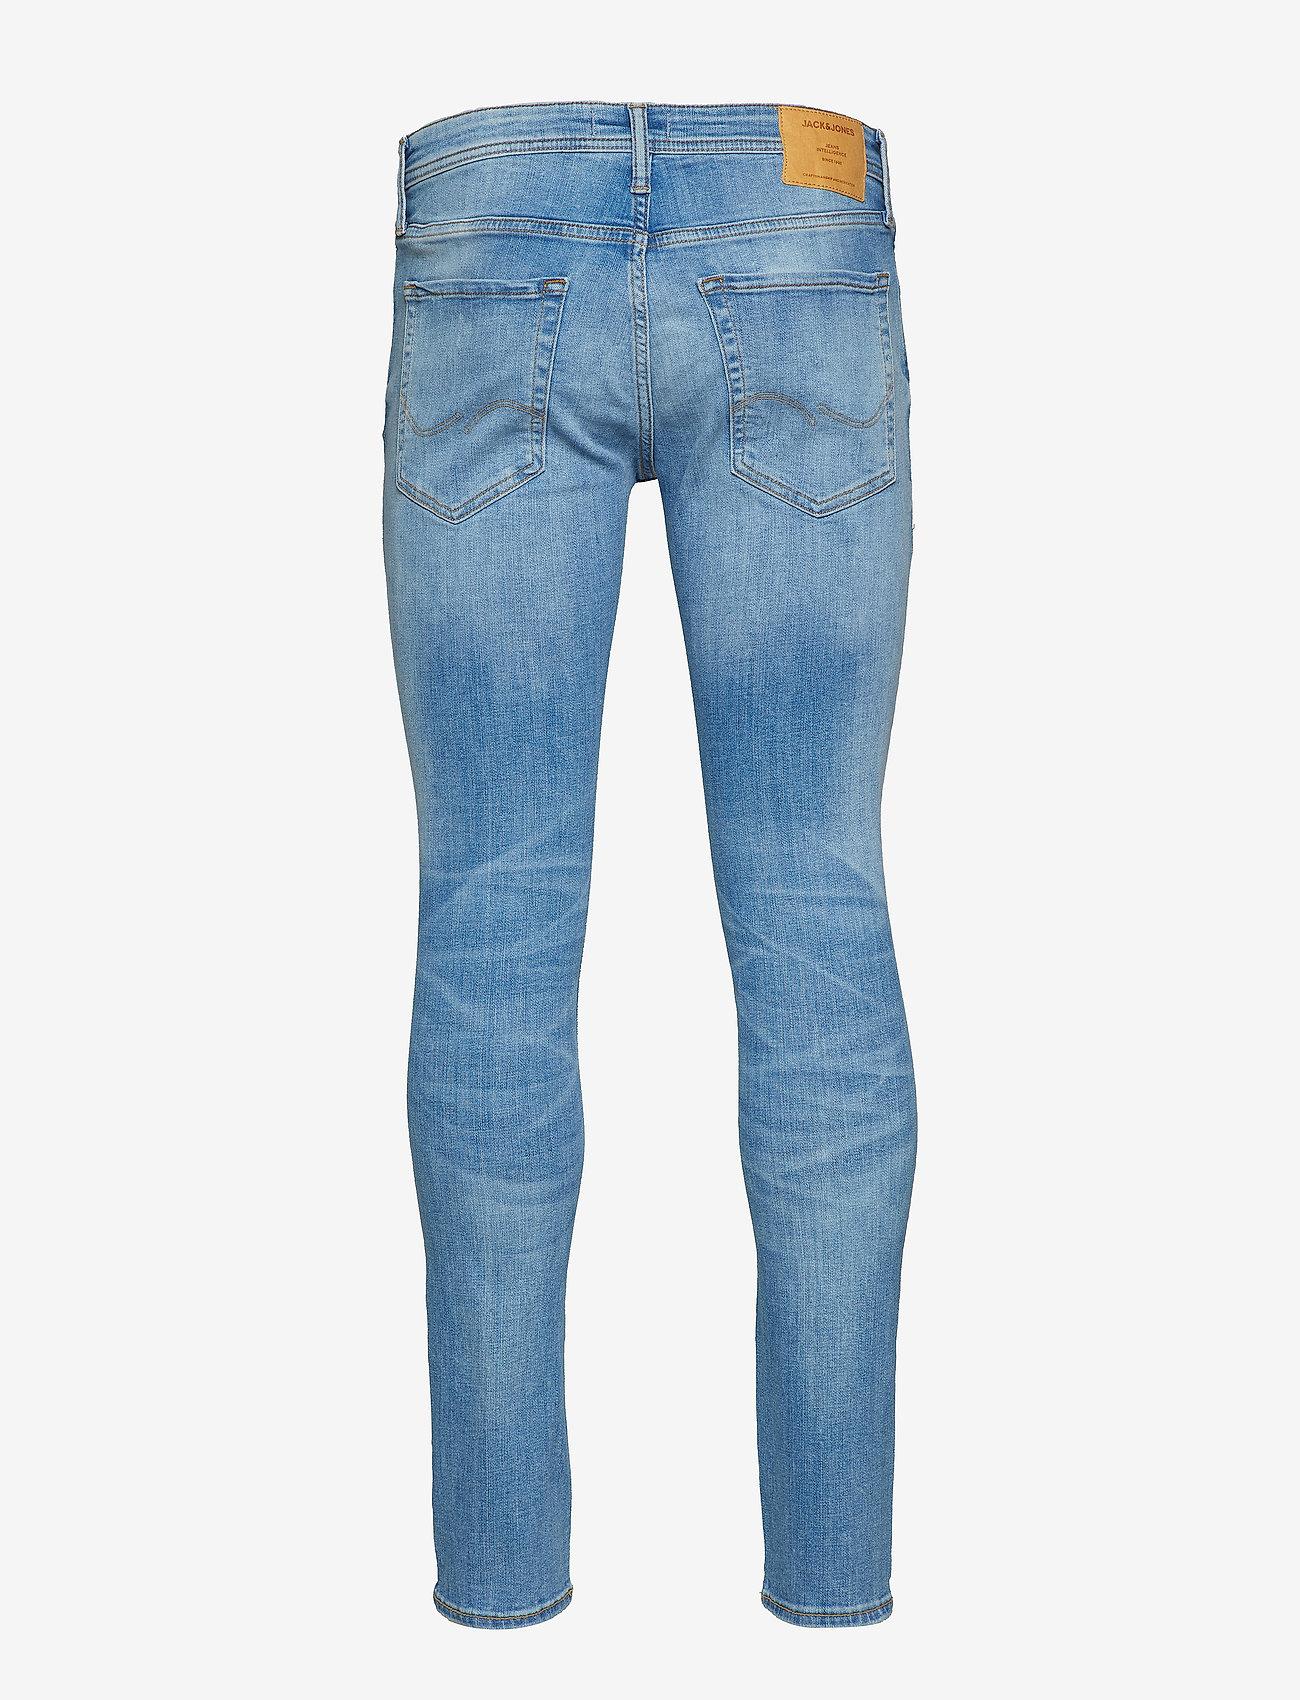 Jack & Jones - JJILIAM JJORIGINAL AM 793 50SPS NOOS - skinny jeans - blue denim - 1